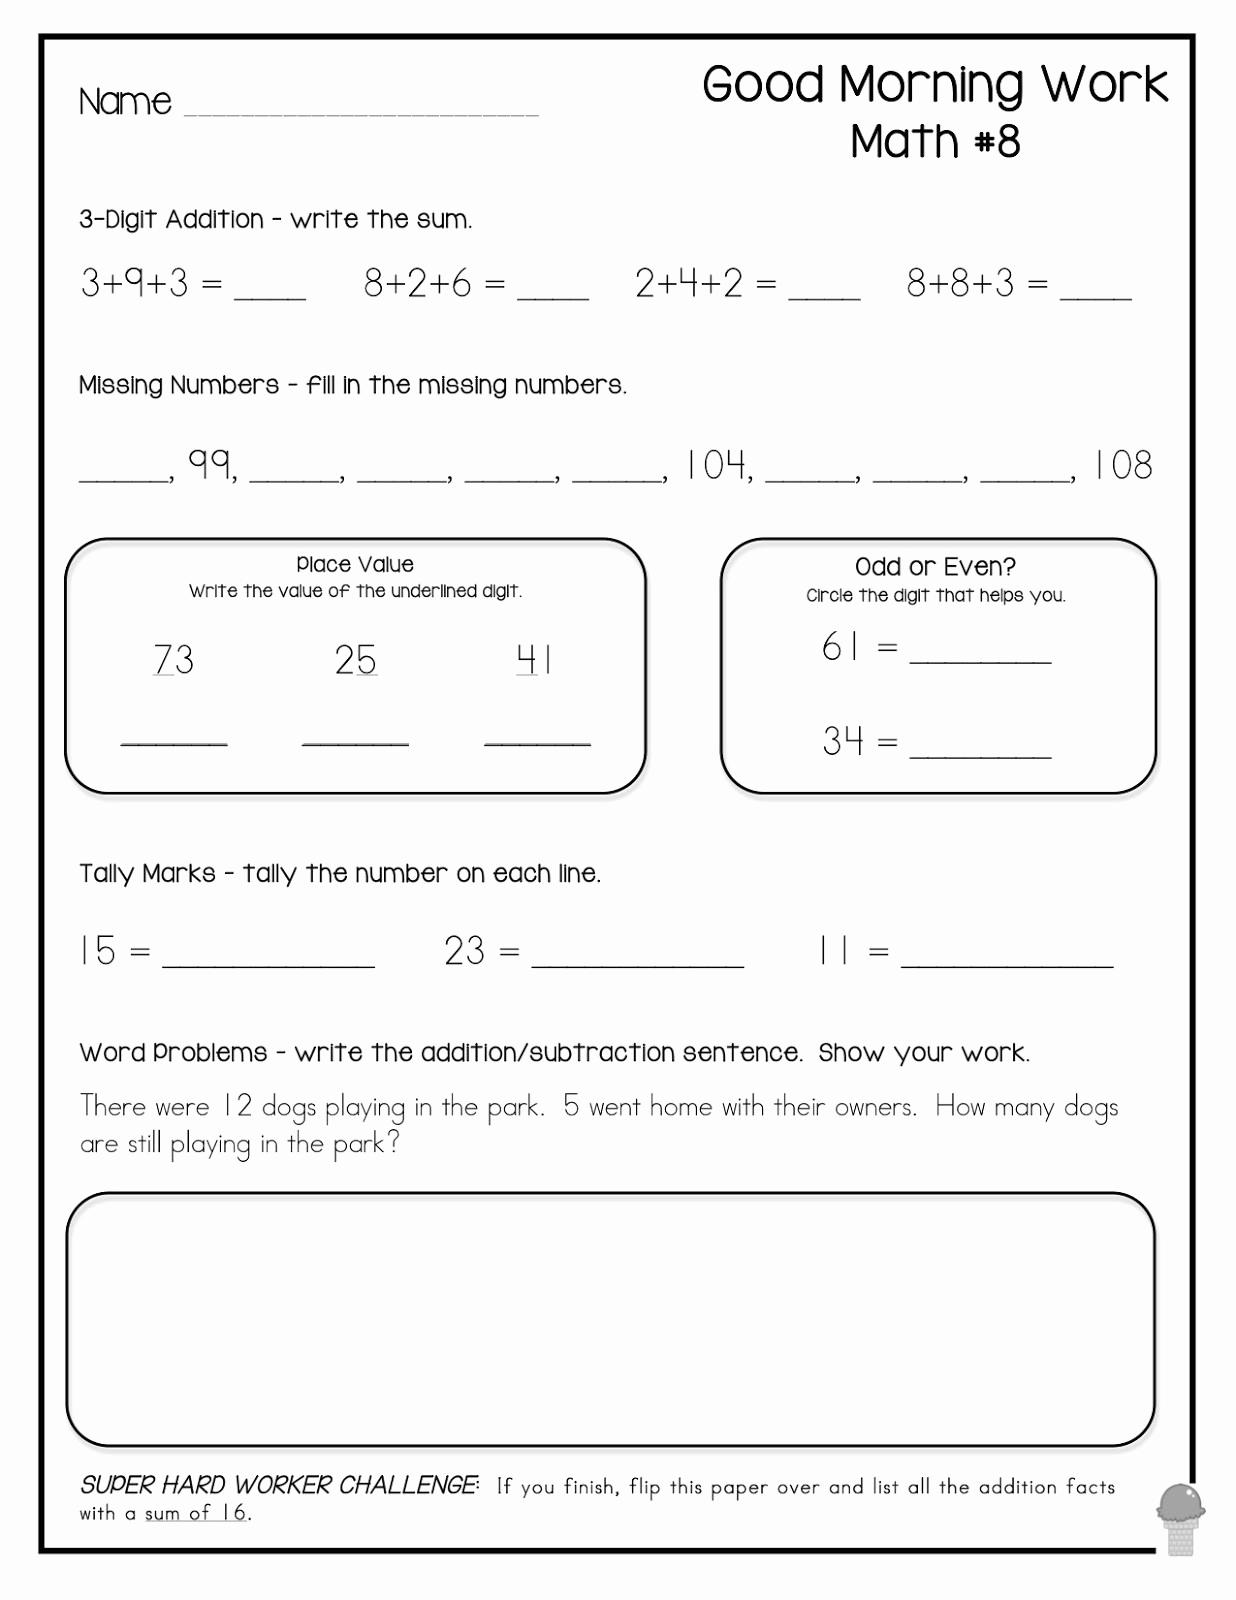 3rd Grade Brain Teasers Worksheets Elegant 3rd Grade Math Brain Teasers Worksheets Printable — Db